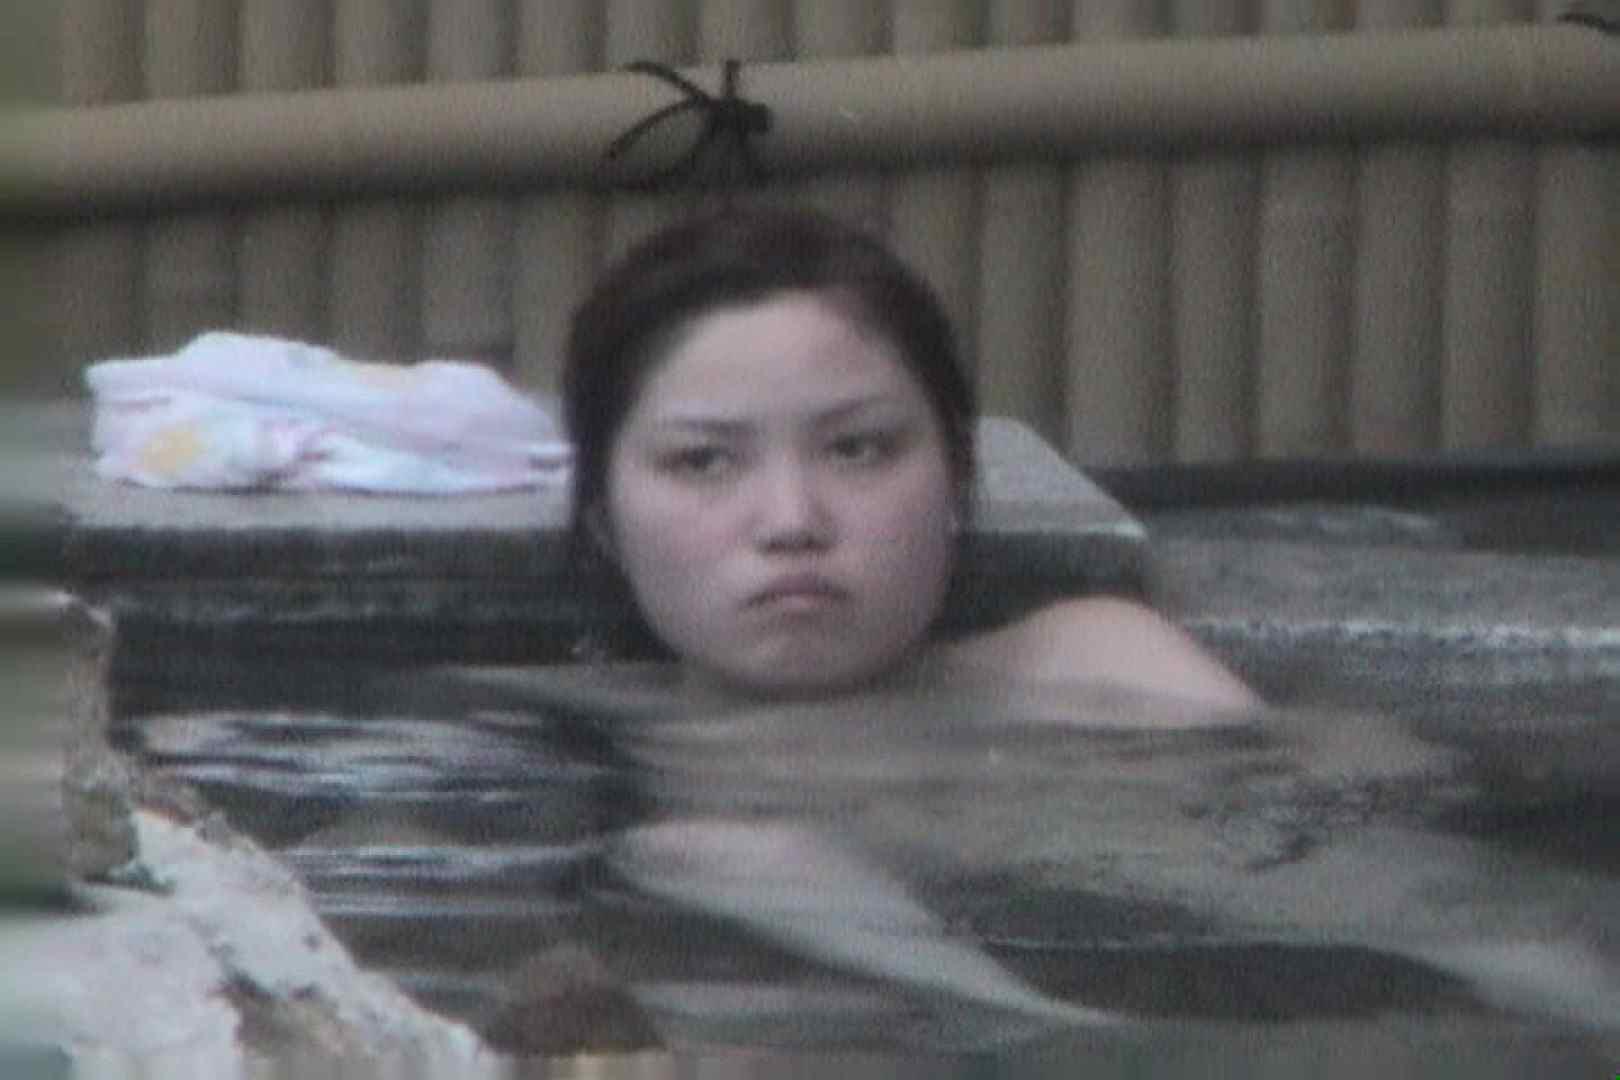 Aquaな露天風呂Vol.602 OLセックス 盗み撮りオマンコ動画キャプチャ 70画像 65